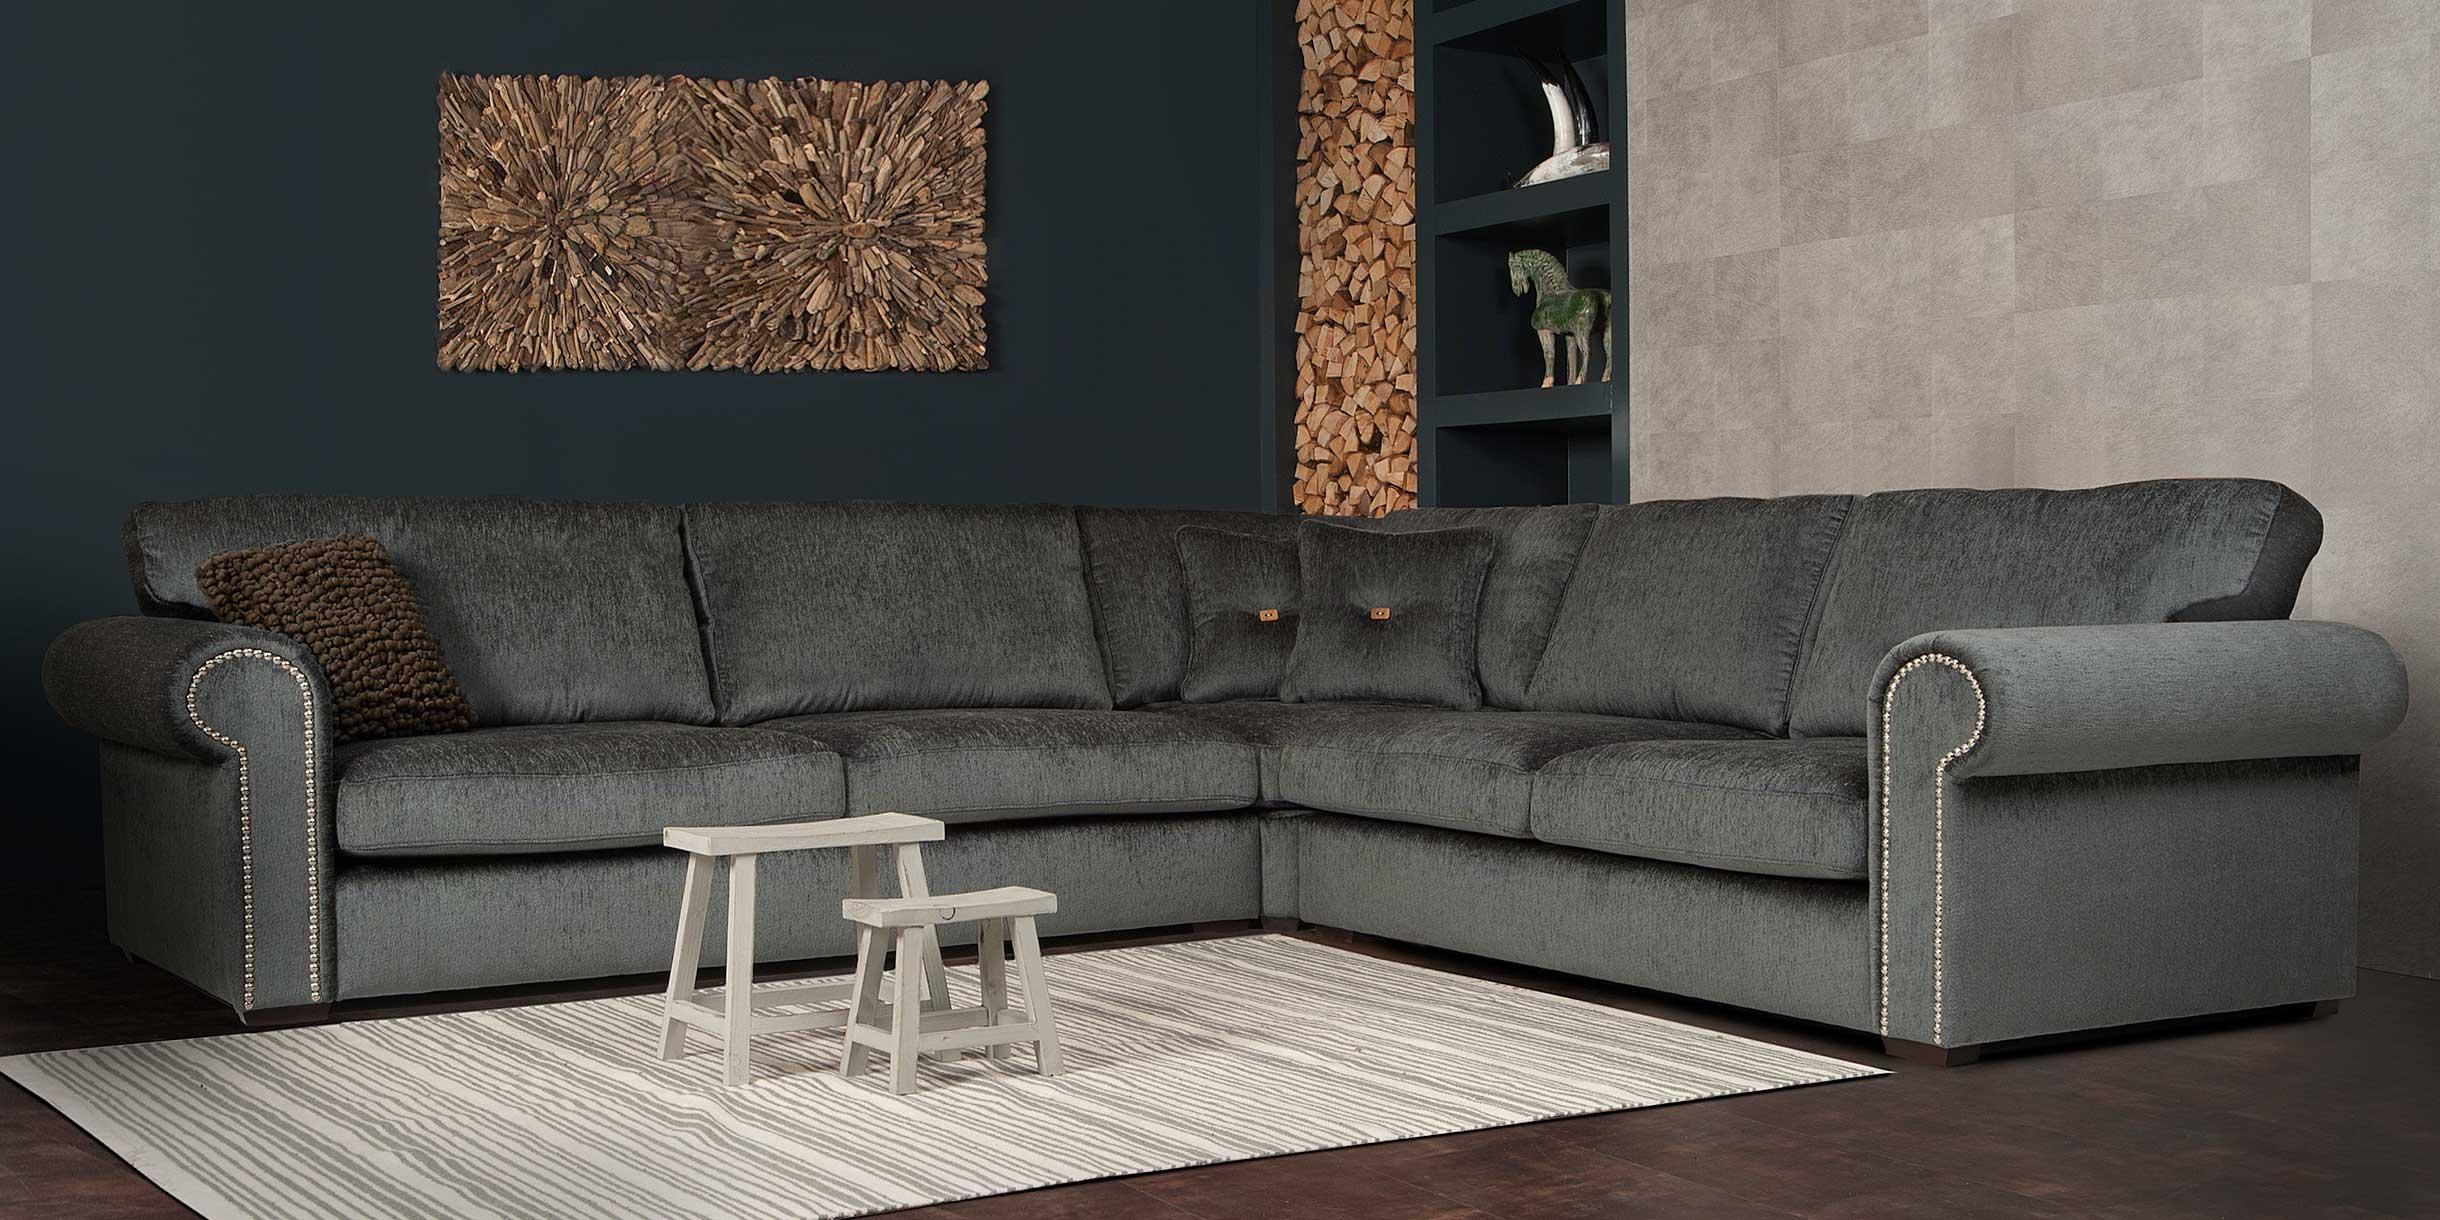 UrbanSofa-Merlin-Hoekbank-Casia-knoop-hout